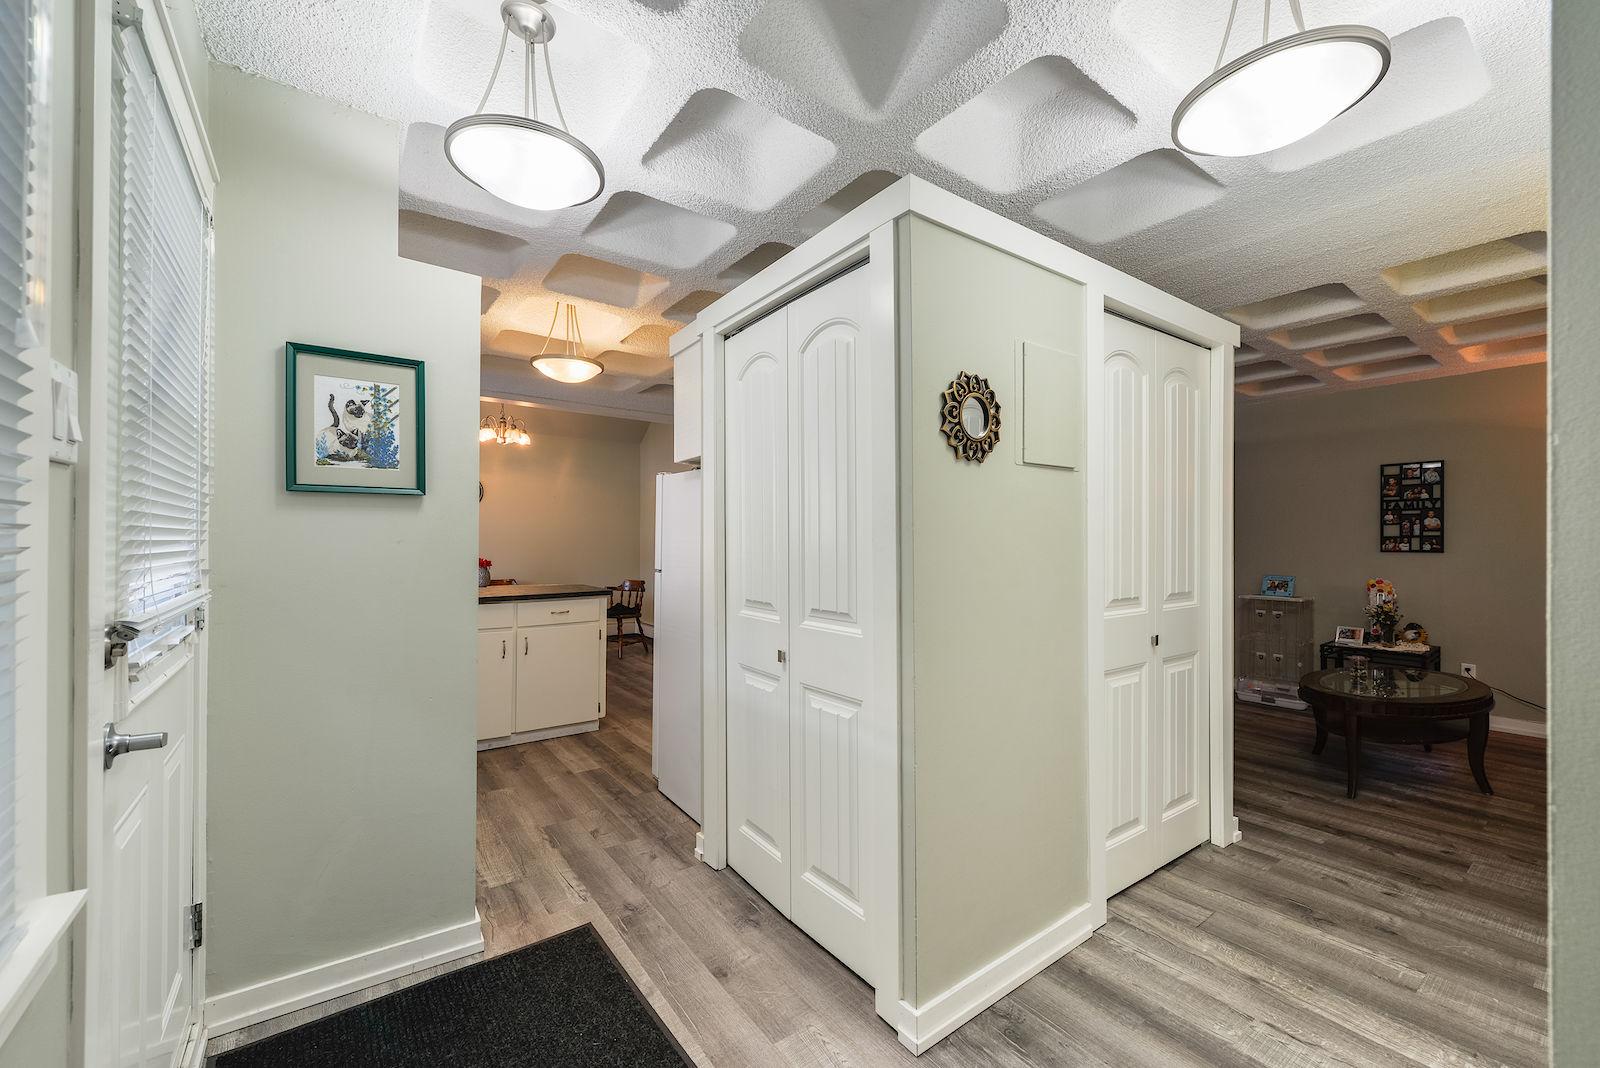 edmonton apartment for rent westridge nw 2 3